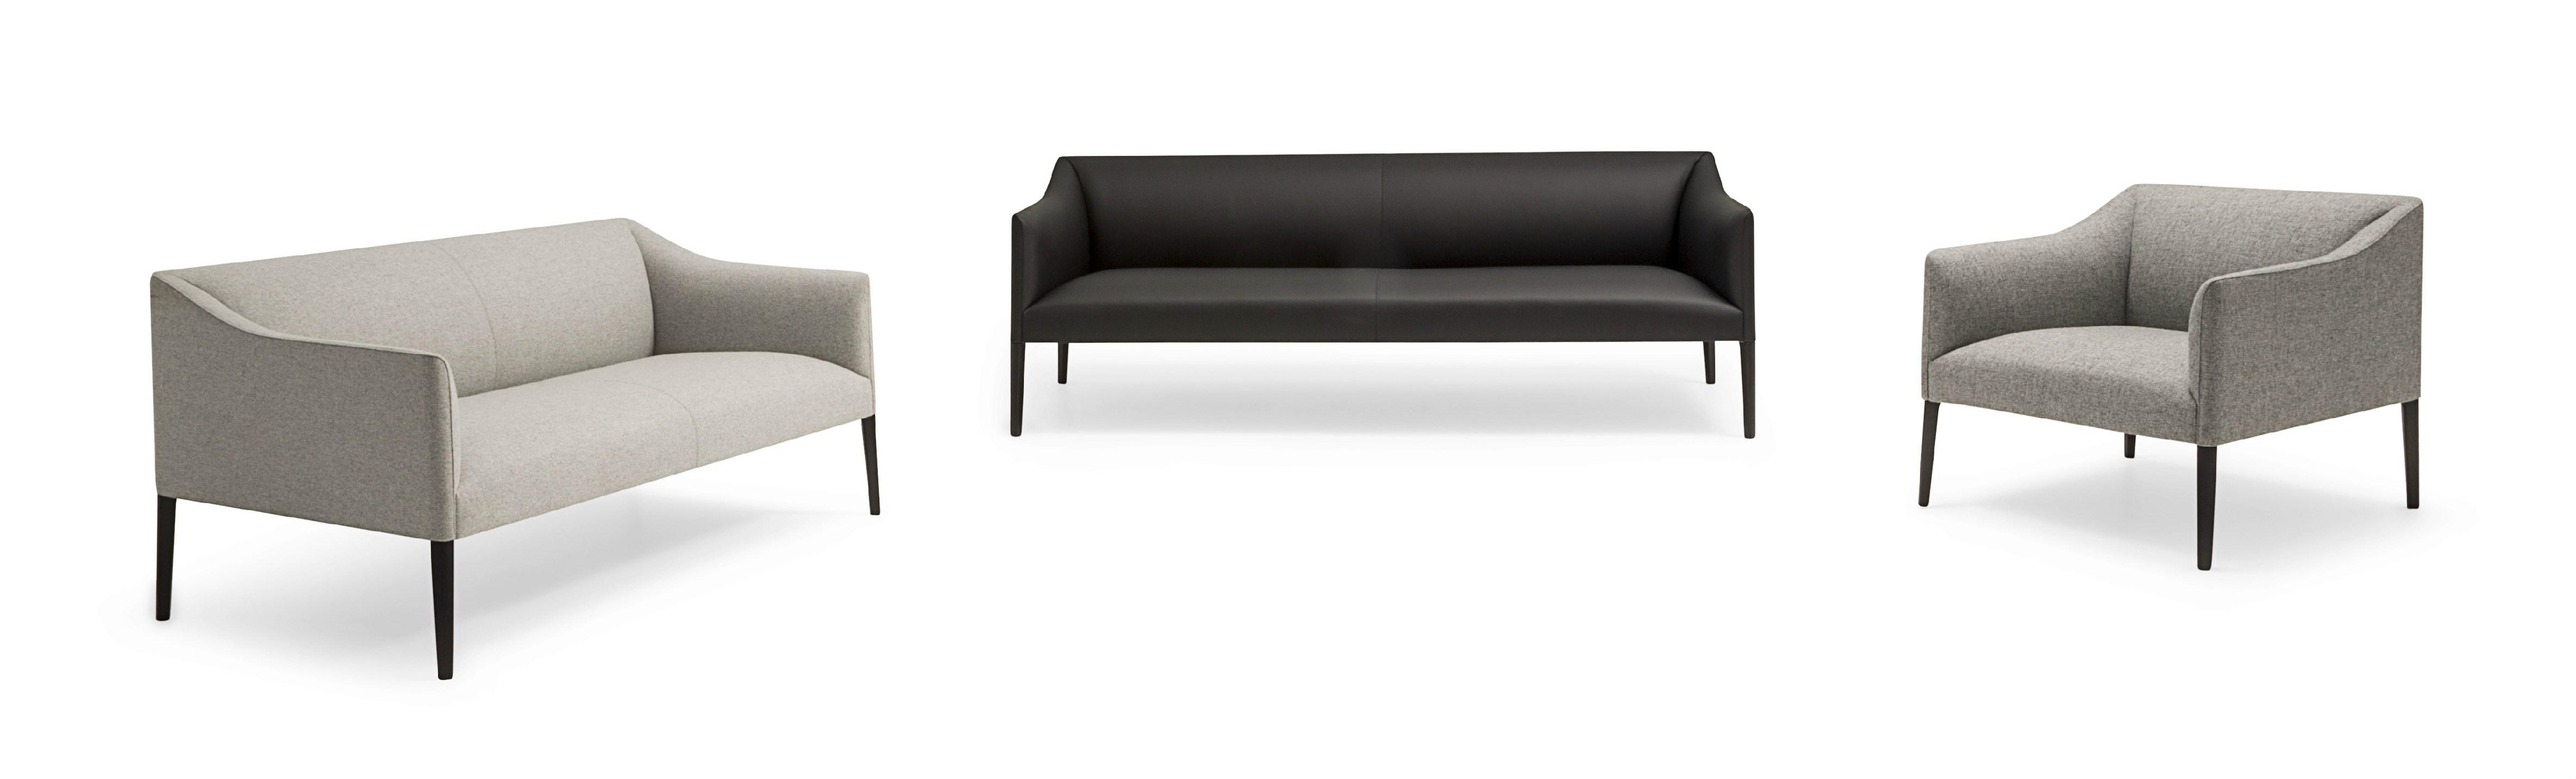 Couve Collection by Piergiorgio Cazzaniga for Andreu World